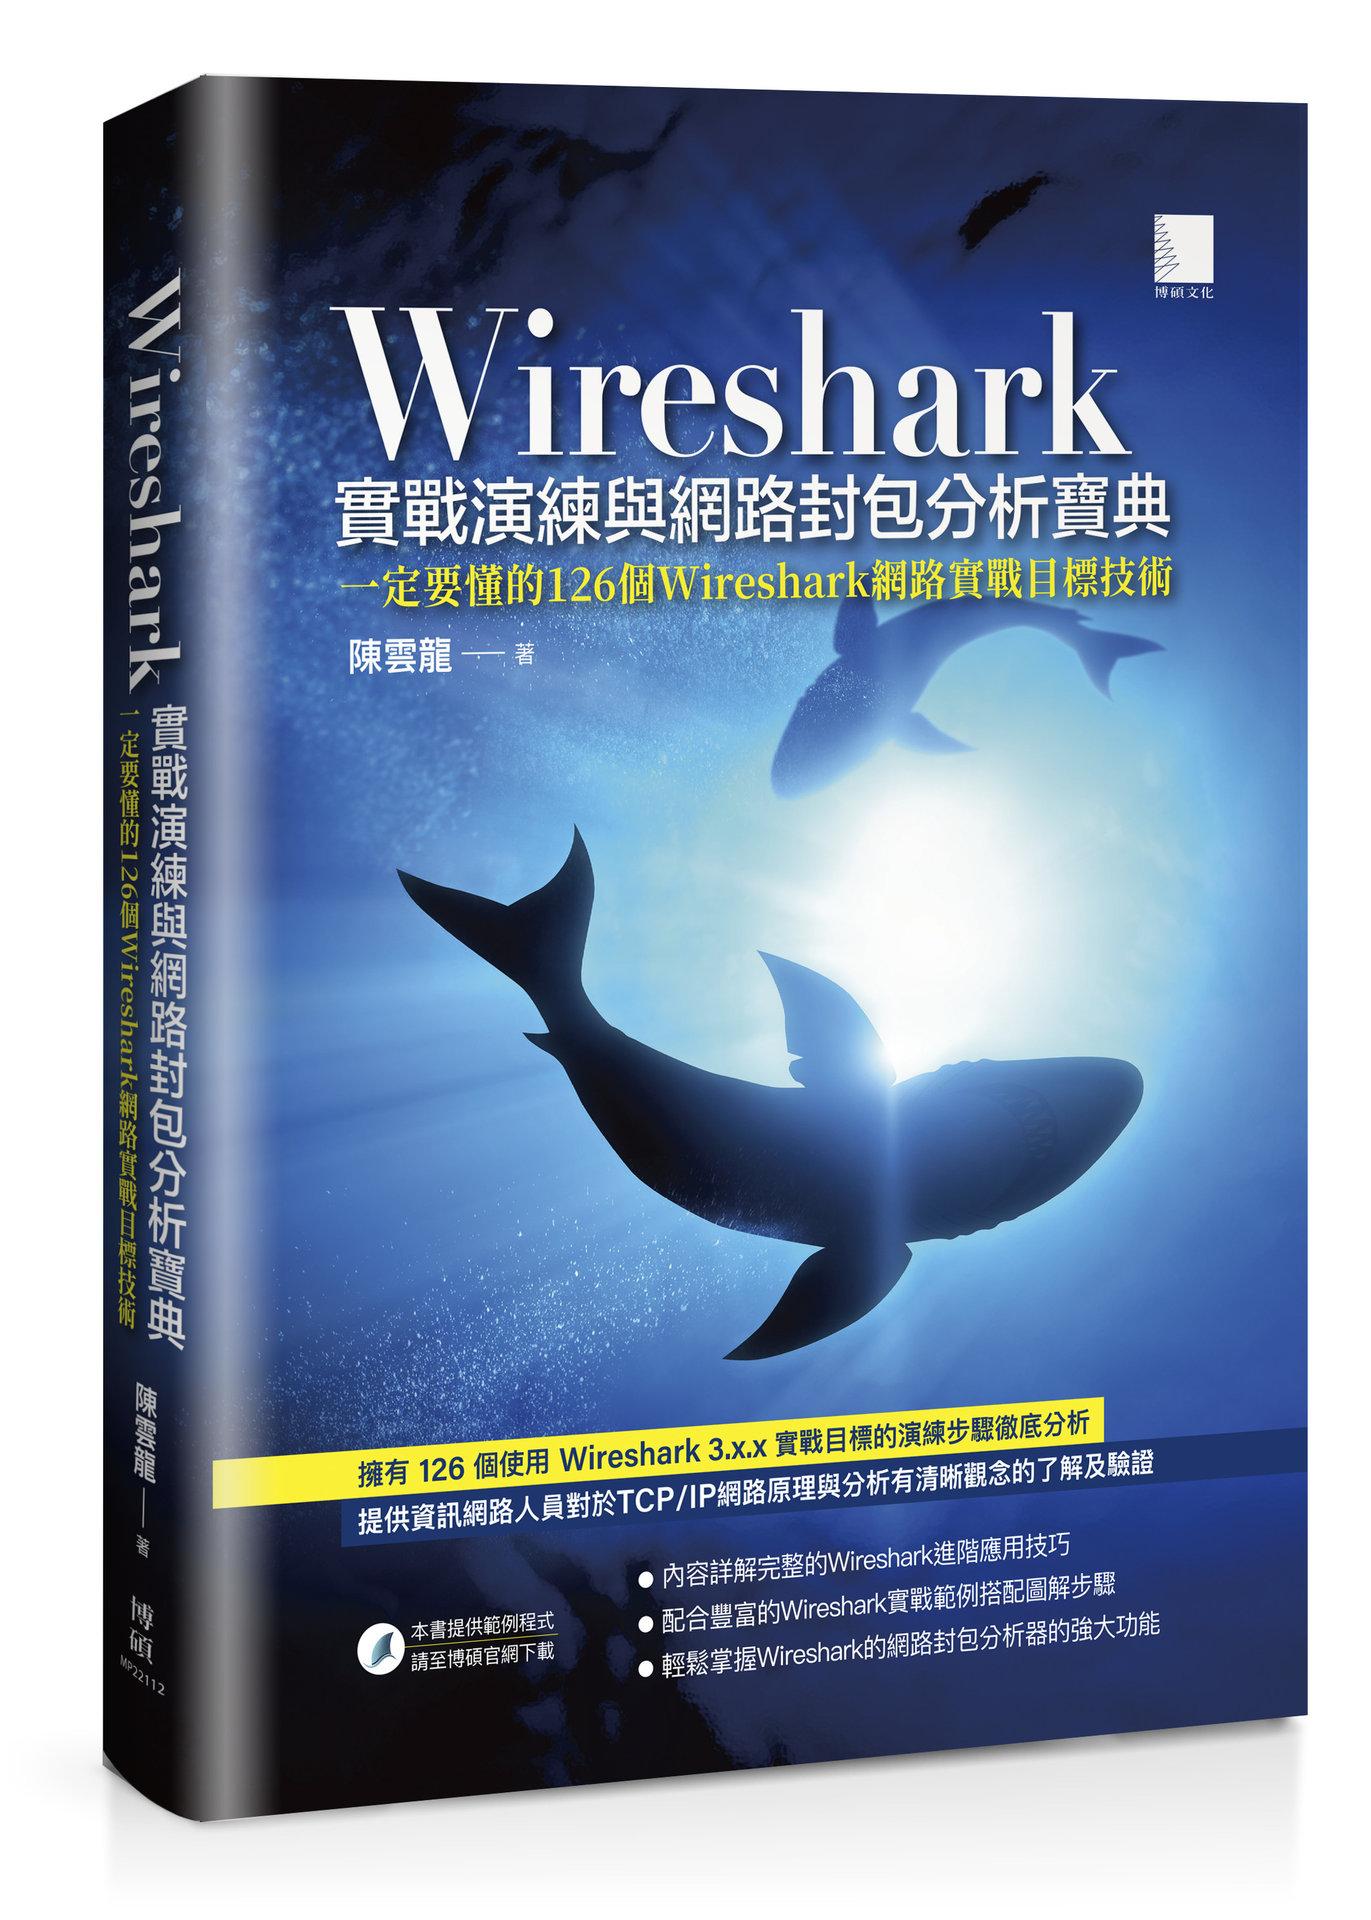 Wireshark 實戰演練與網路封包分析寶典-preview-1